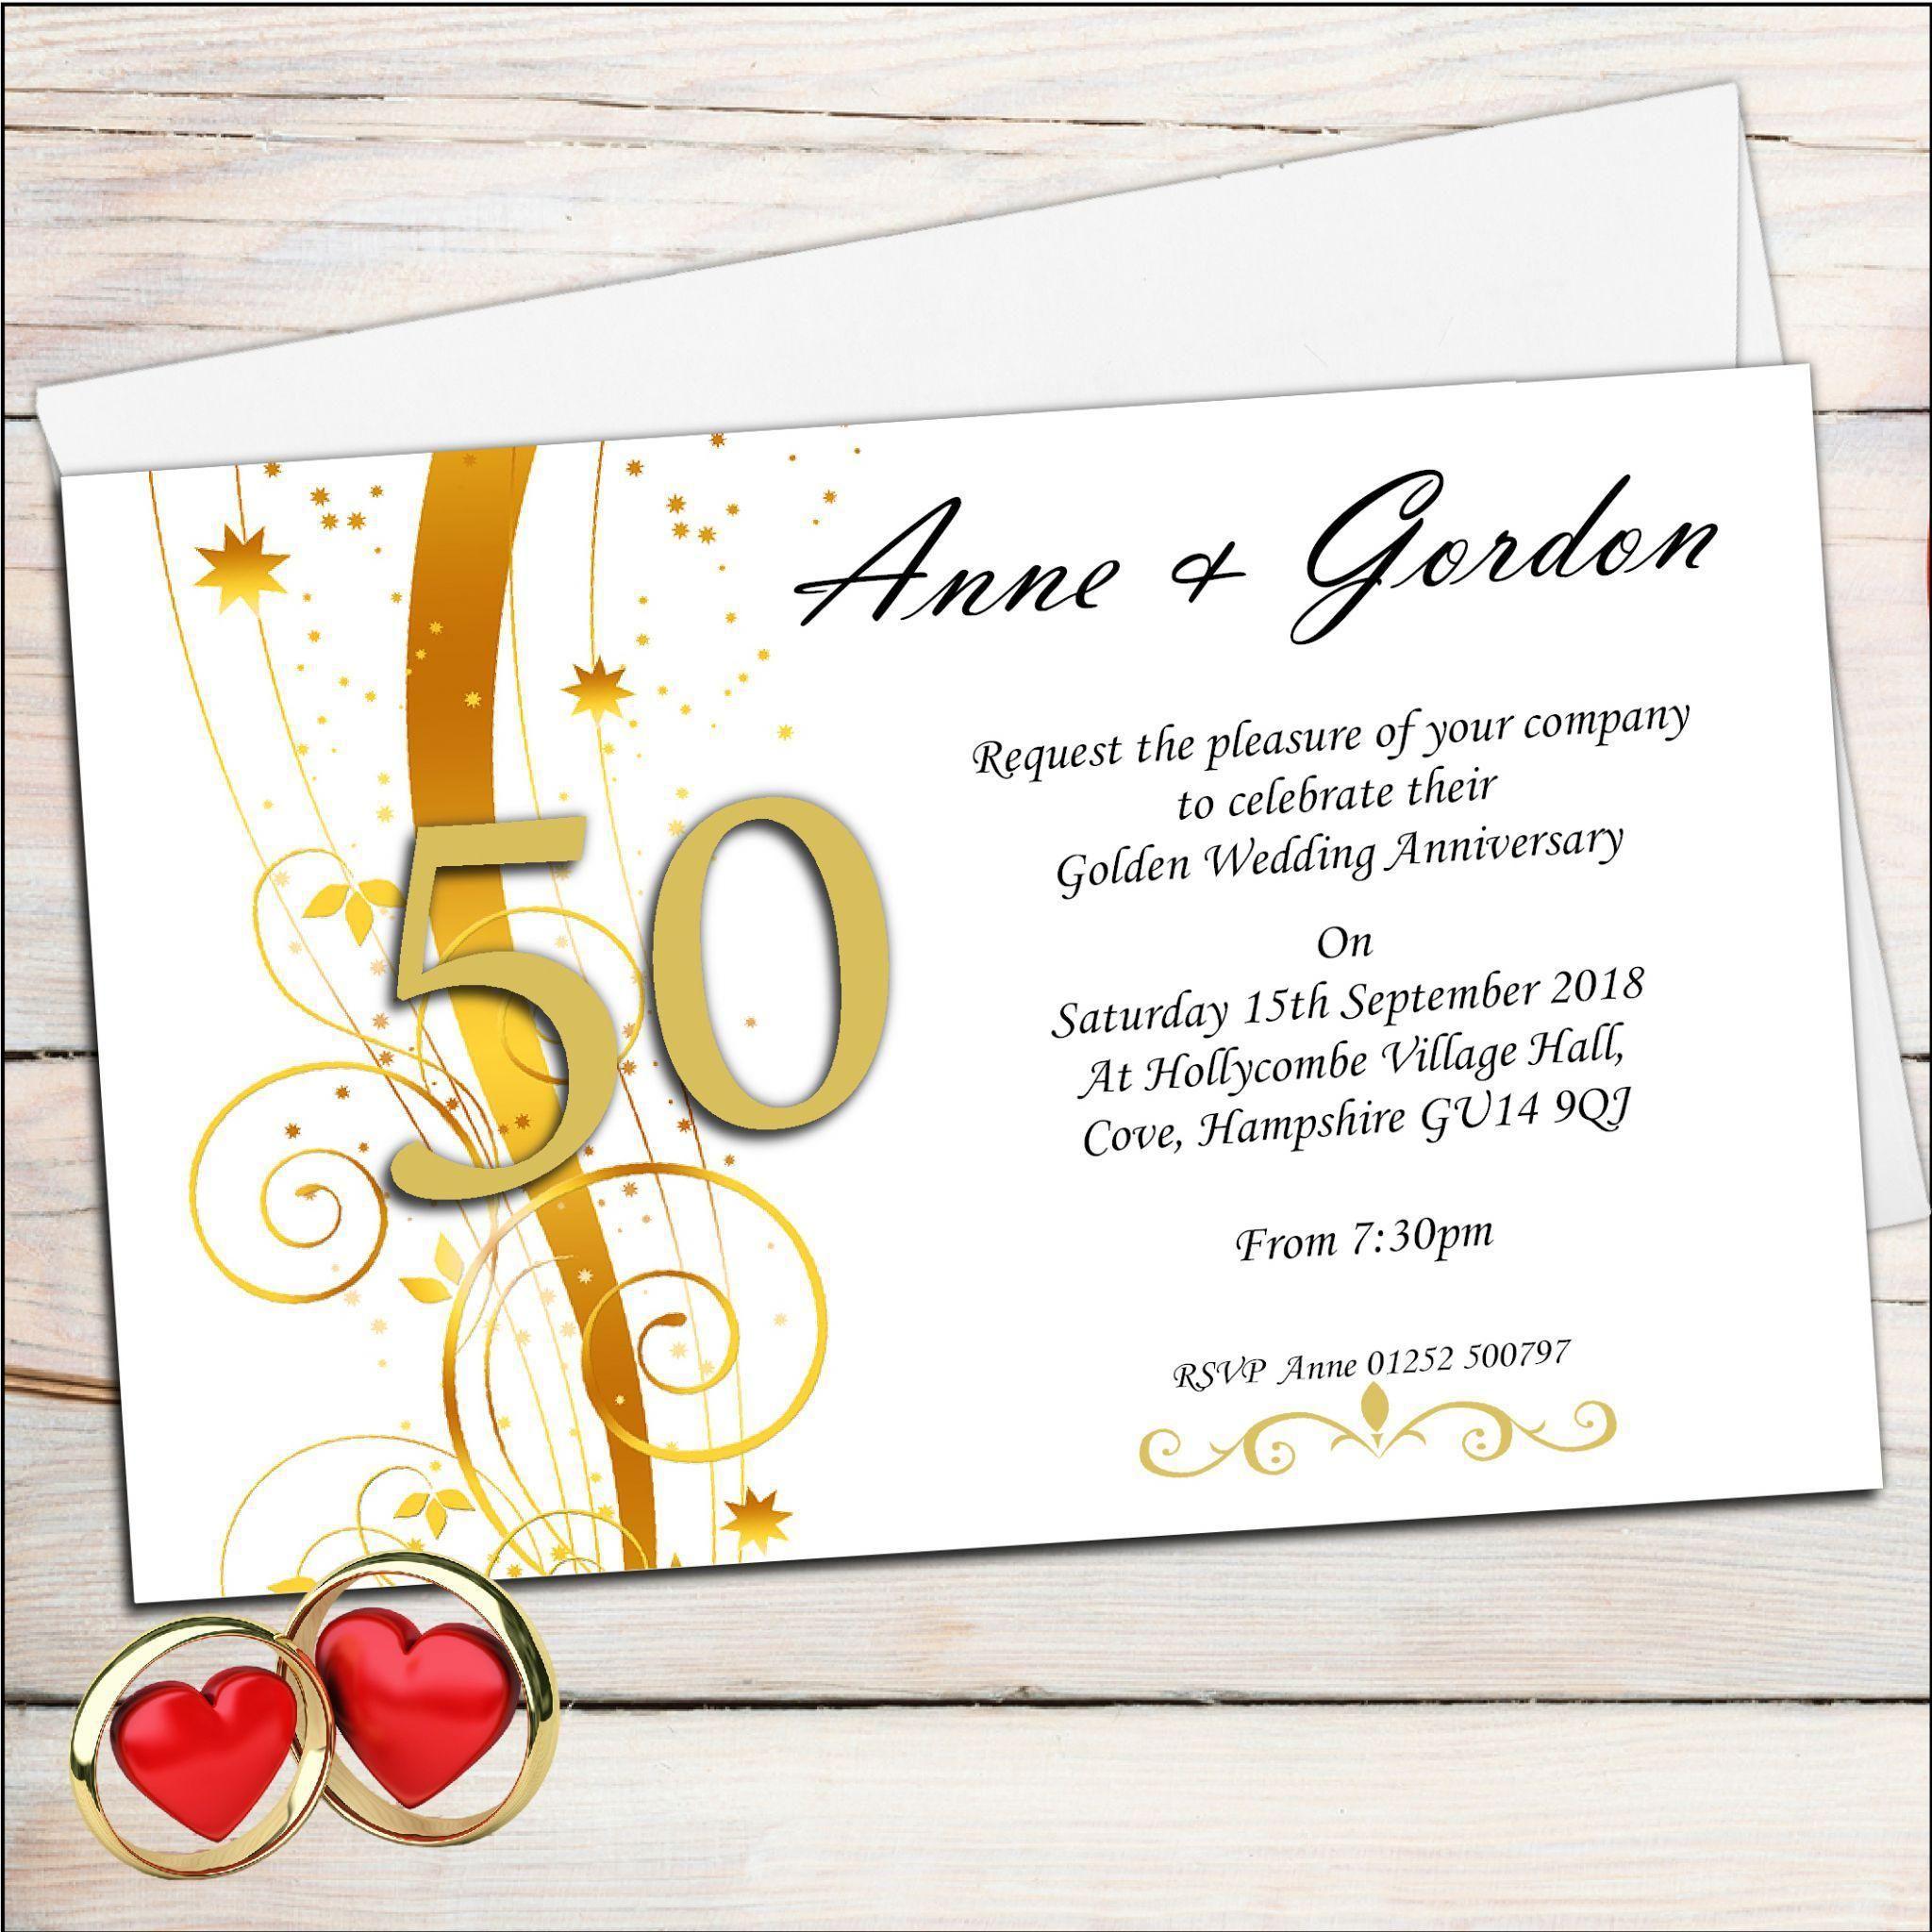 Golden Wedding Anniversary Invitations : Golden Wedding Anniversary ...